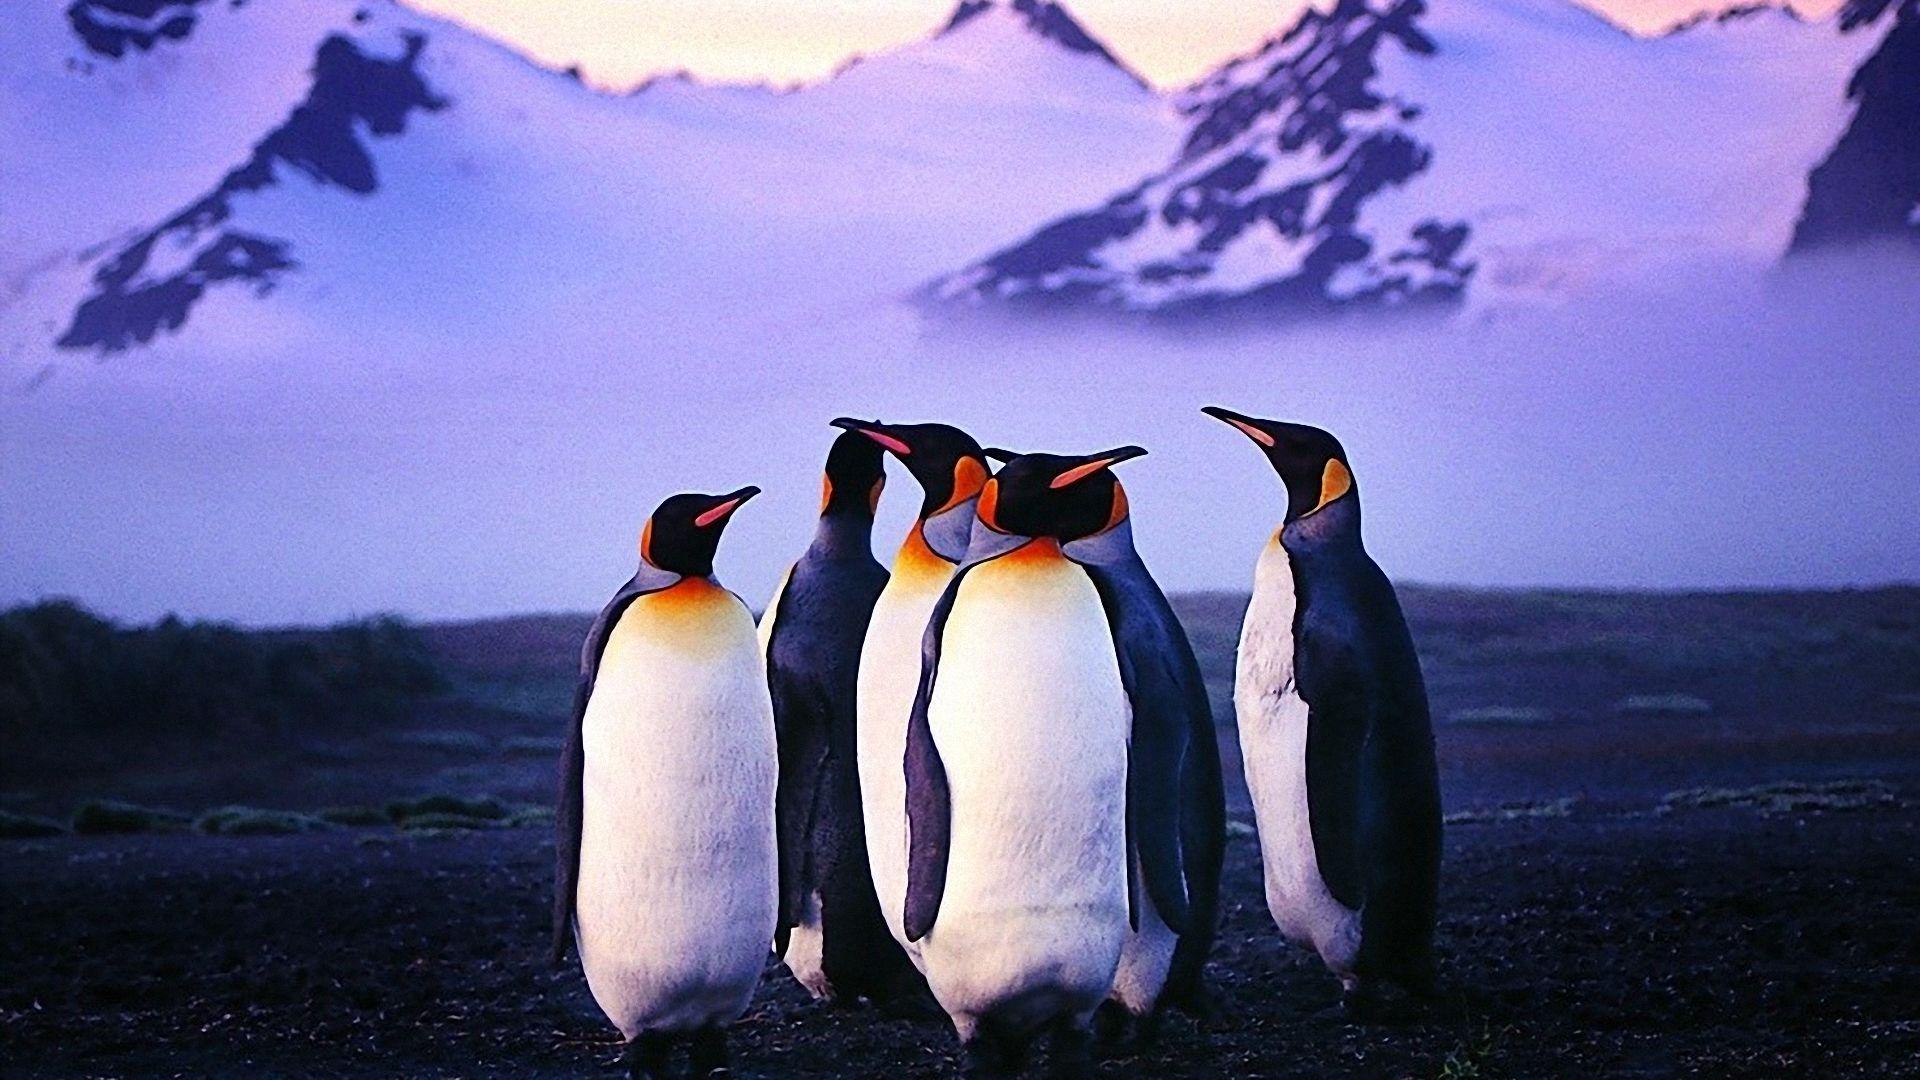 Penguin Wallpaper Wallpaperspenguin Wallpapers - High Resolution Penguin Hd , HD Wallpaper & Backgrounds